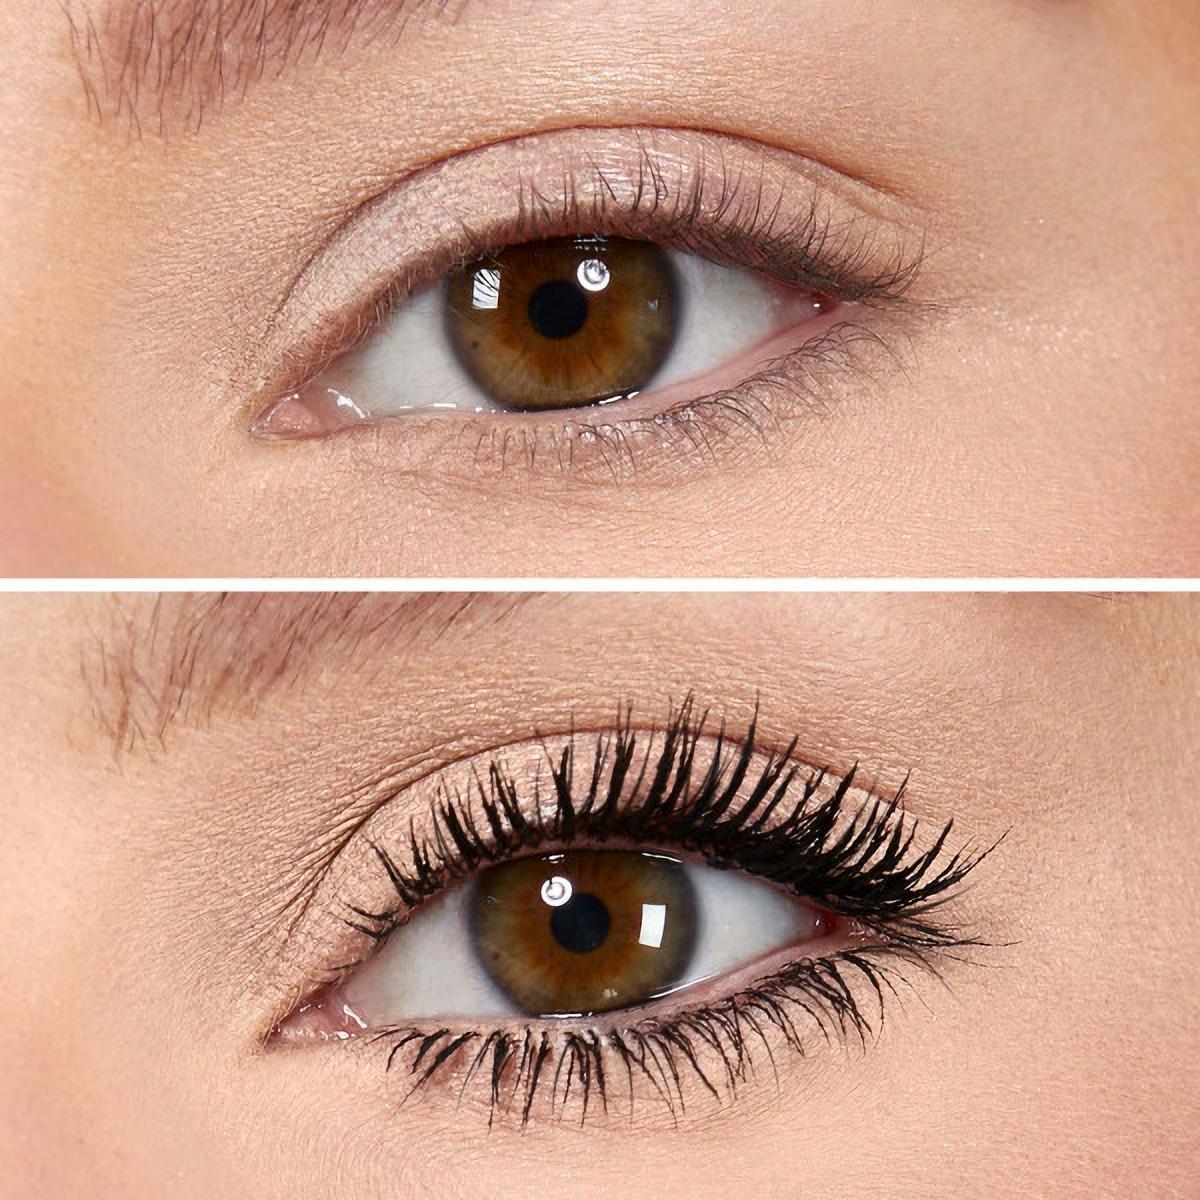 Nabla Cosmetics Vicious Mascara Before & After